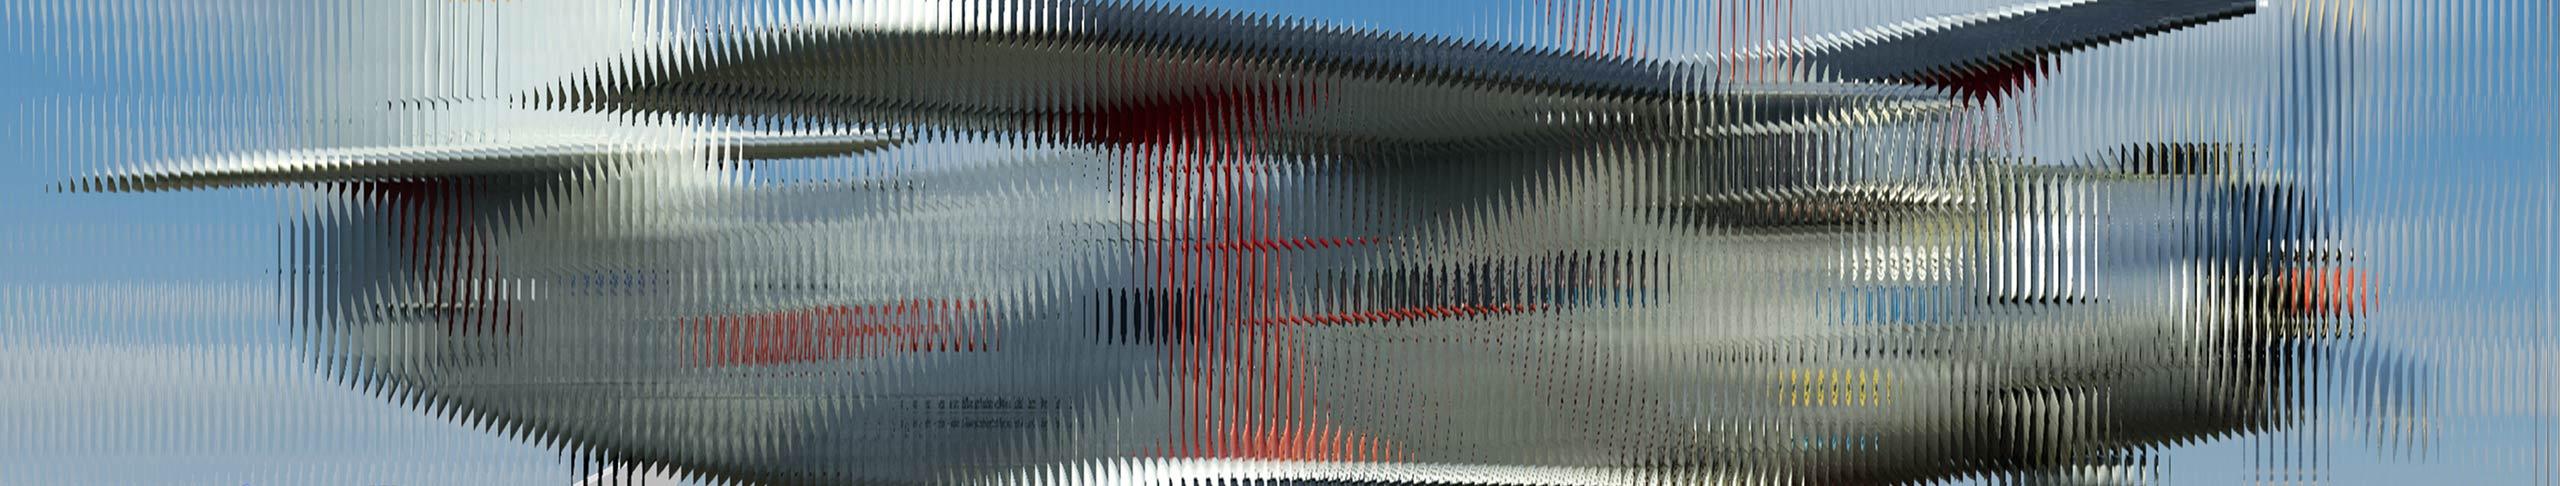 lentikulardruck - interlaced image